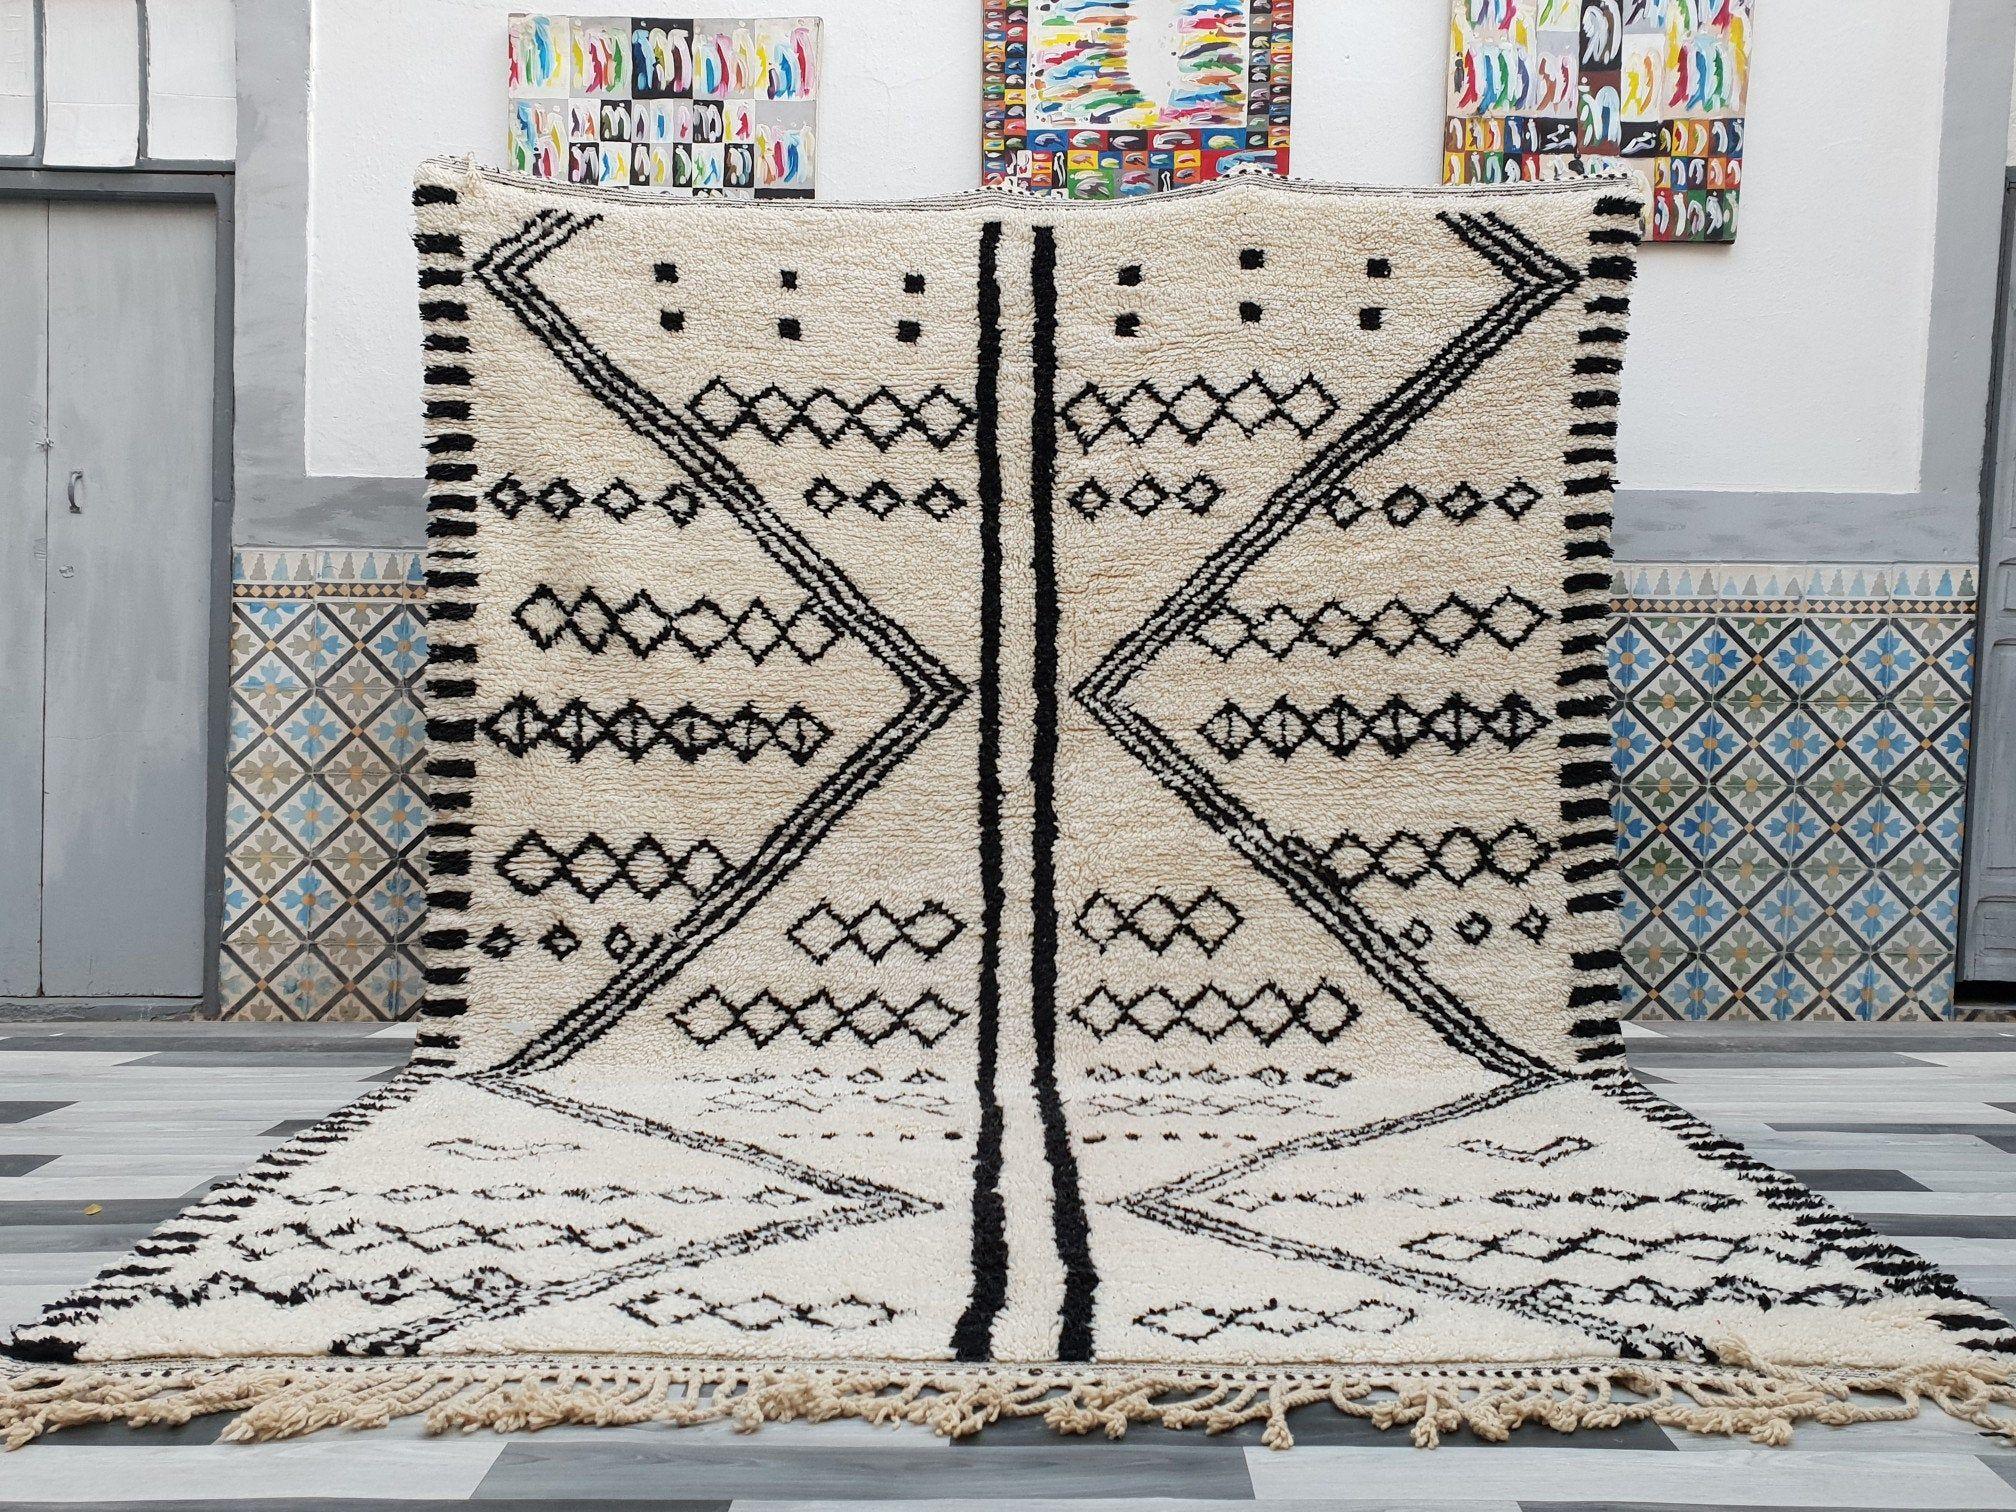 Authentieke Marokkaanse Rug Beni Ourain Deken Handgeweven 100 Wol Tapijt Karpetten Marokkaanse Berber Tapijt Vloer Tapijten Tapis Berbere In 2020 Beni Ourain Rugs Moroccan Rug Carpets Area Rugs